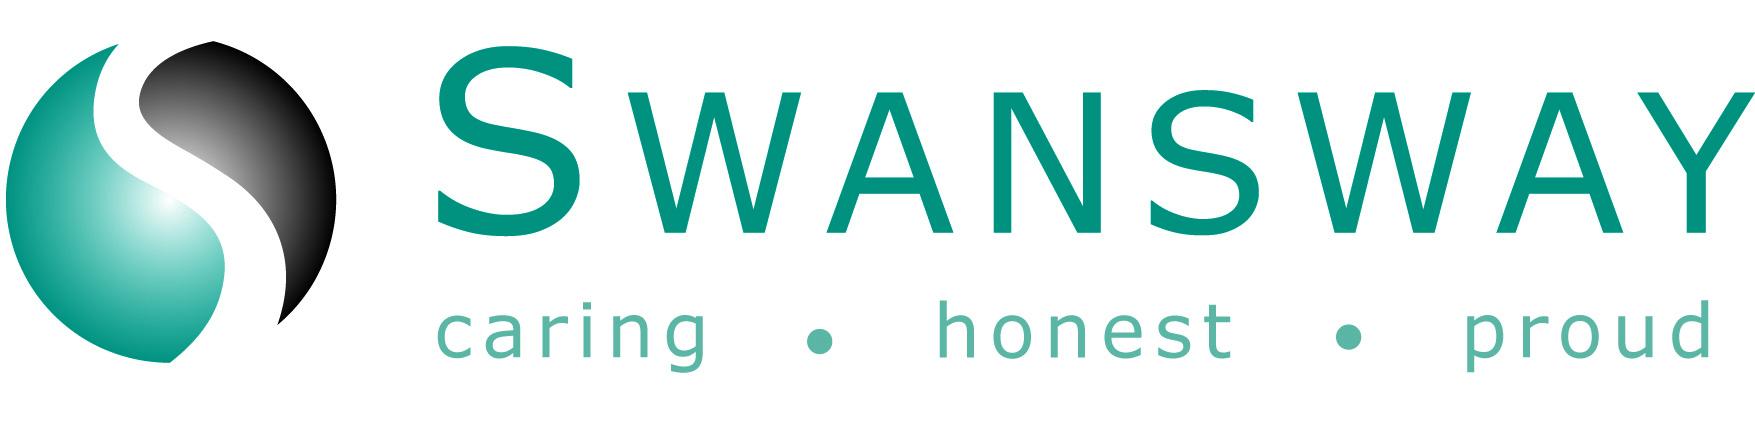 Swansway